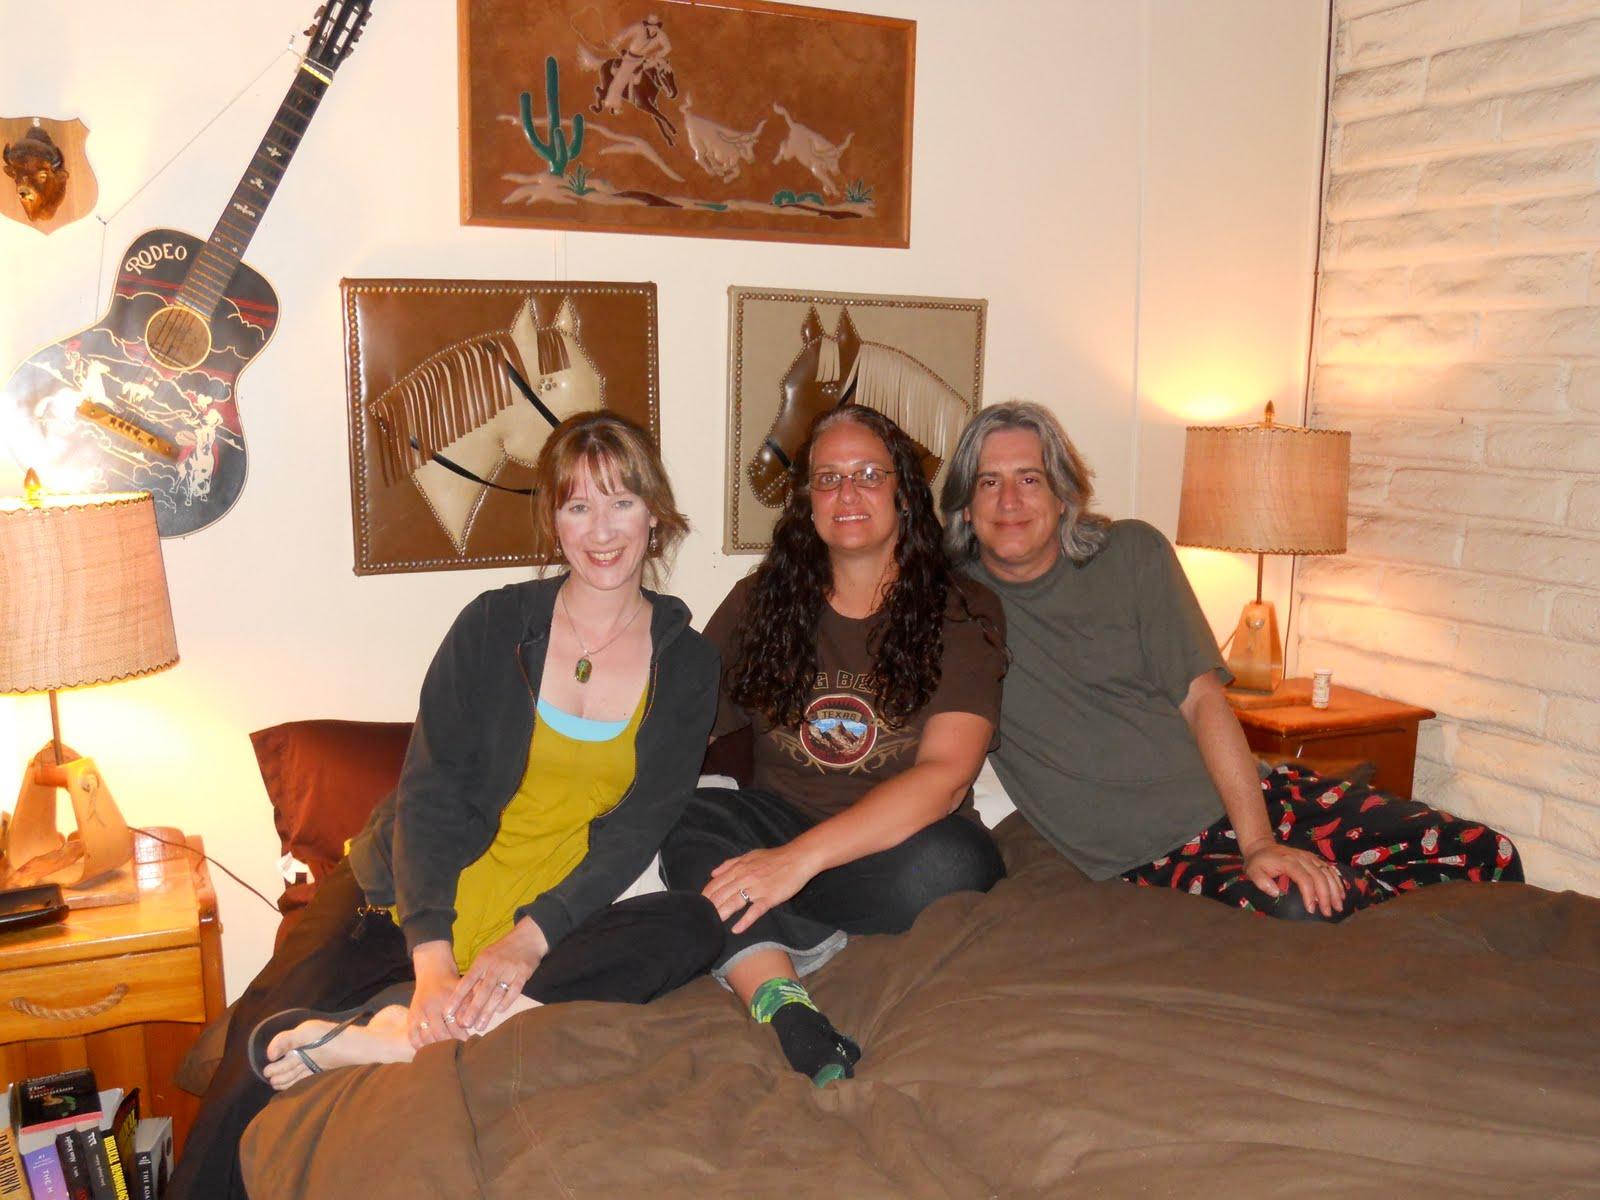 http://2.bp.blogspot.com/_I-S-z8KMbCI/S_xAY0jQfNI/AAAAAAAAFGQ/Ax-EH6BNgjk/s1600/Lori+Connely,+Cheryl+and+Al.JPG